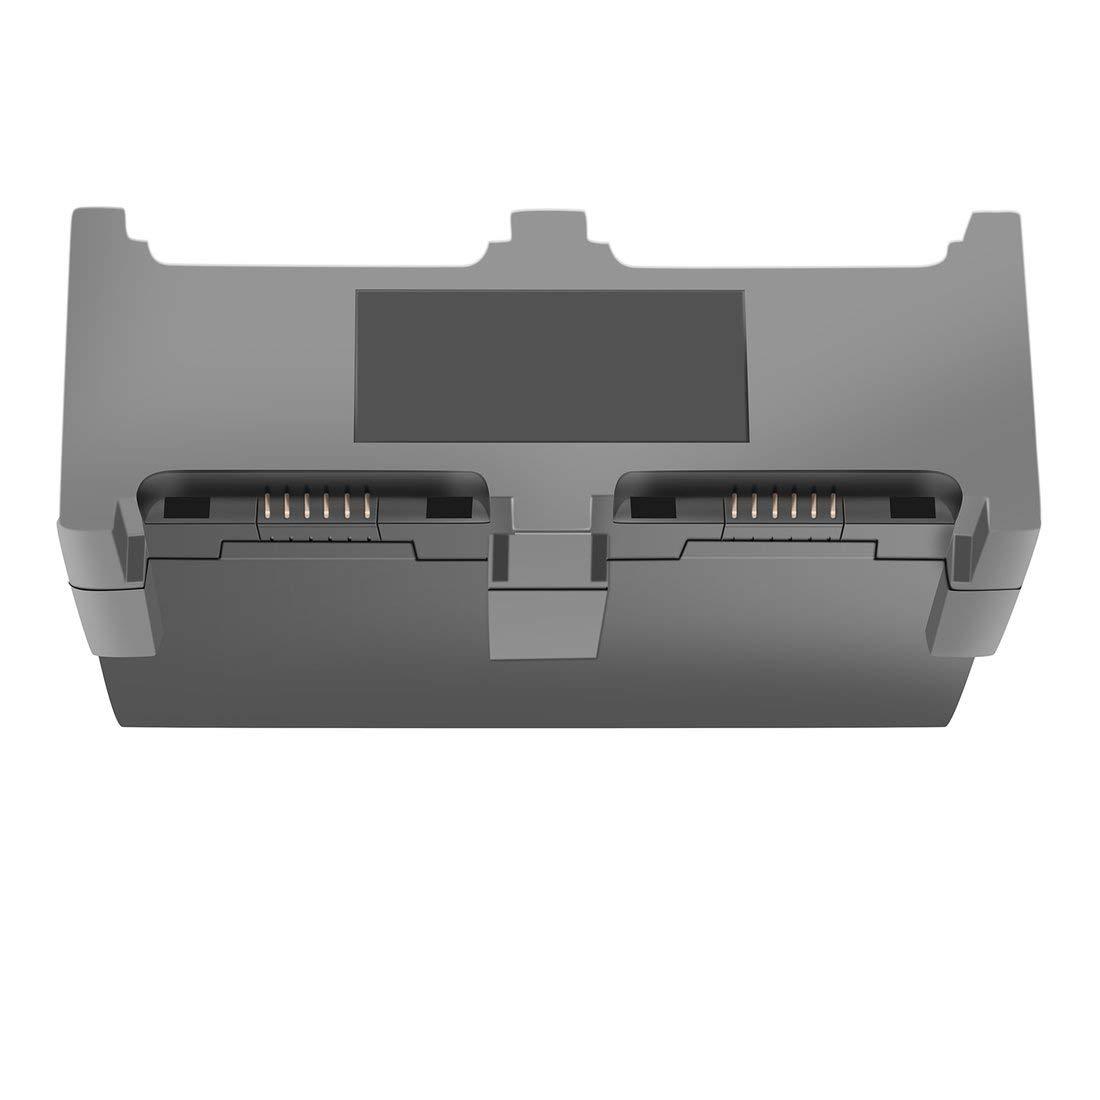 Ladegerät für DJI Funken Drone Schnellladung Hub Multi Ports Batterie 4 Ports Multi Reise Ladegerät Reise Transport Outdoor Ladegerät UAV 35a1ee